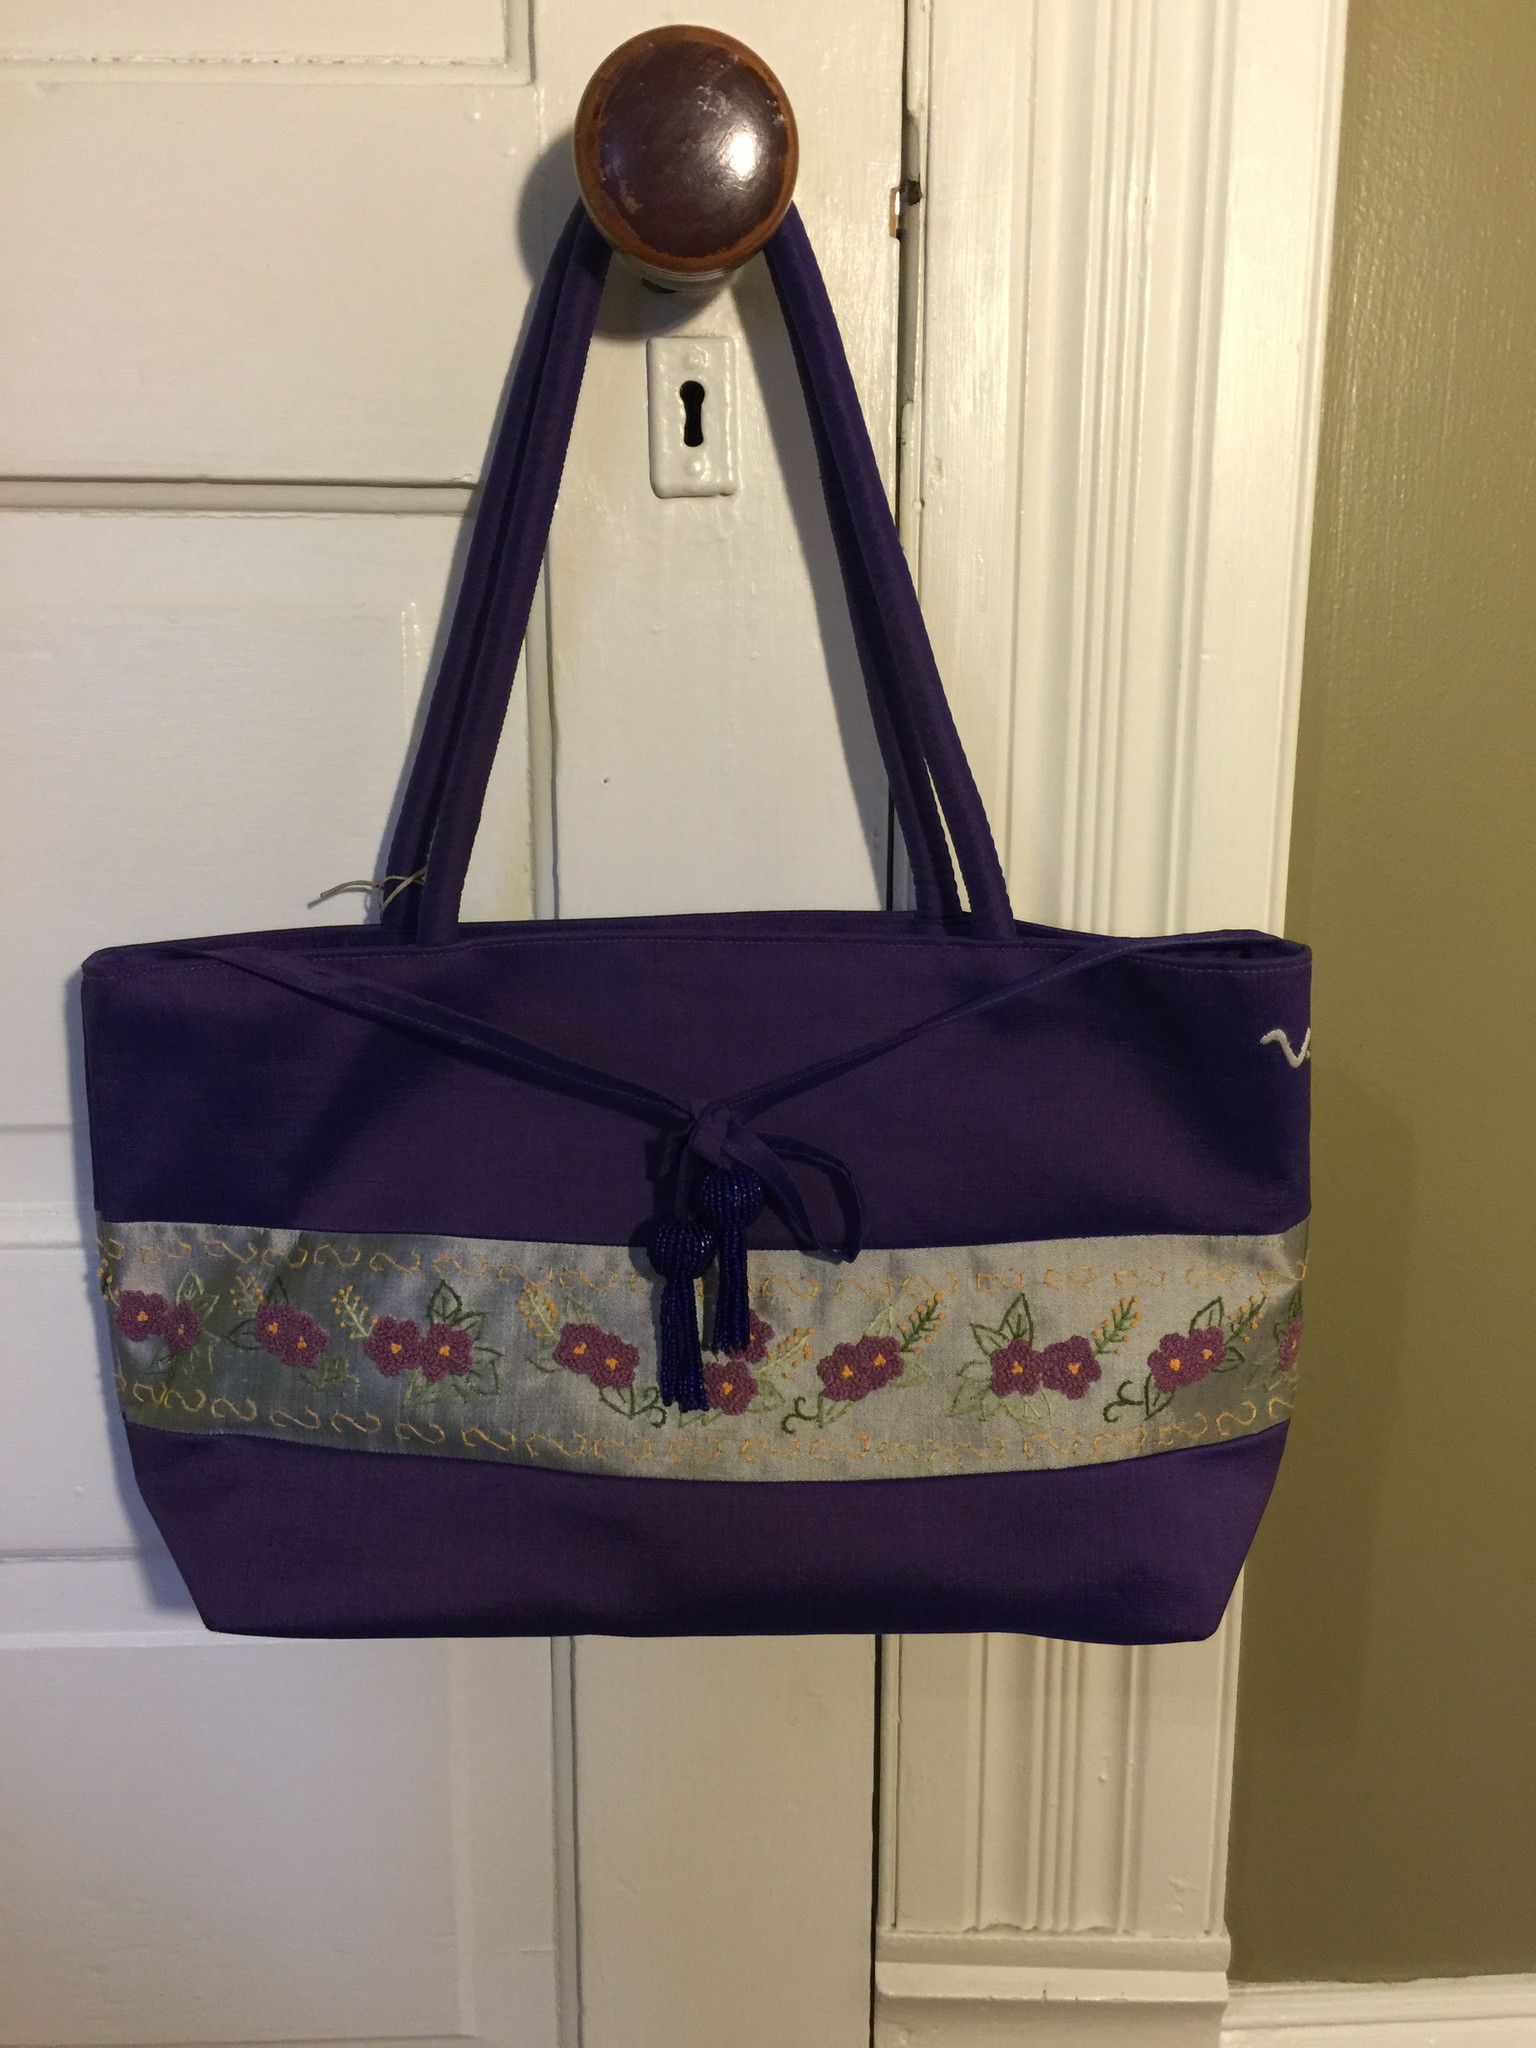 Claire V Clutches Silk Purses Handbags Hand Bags